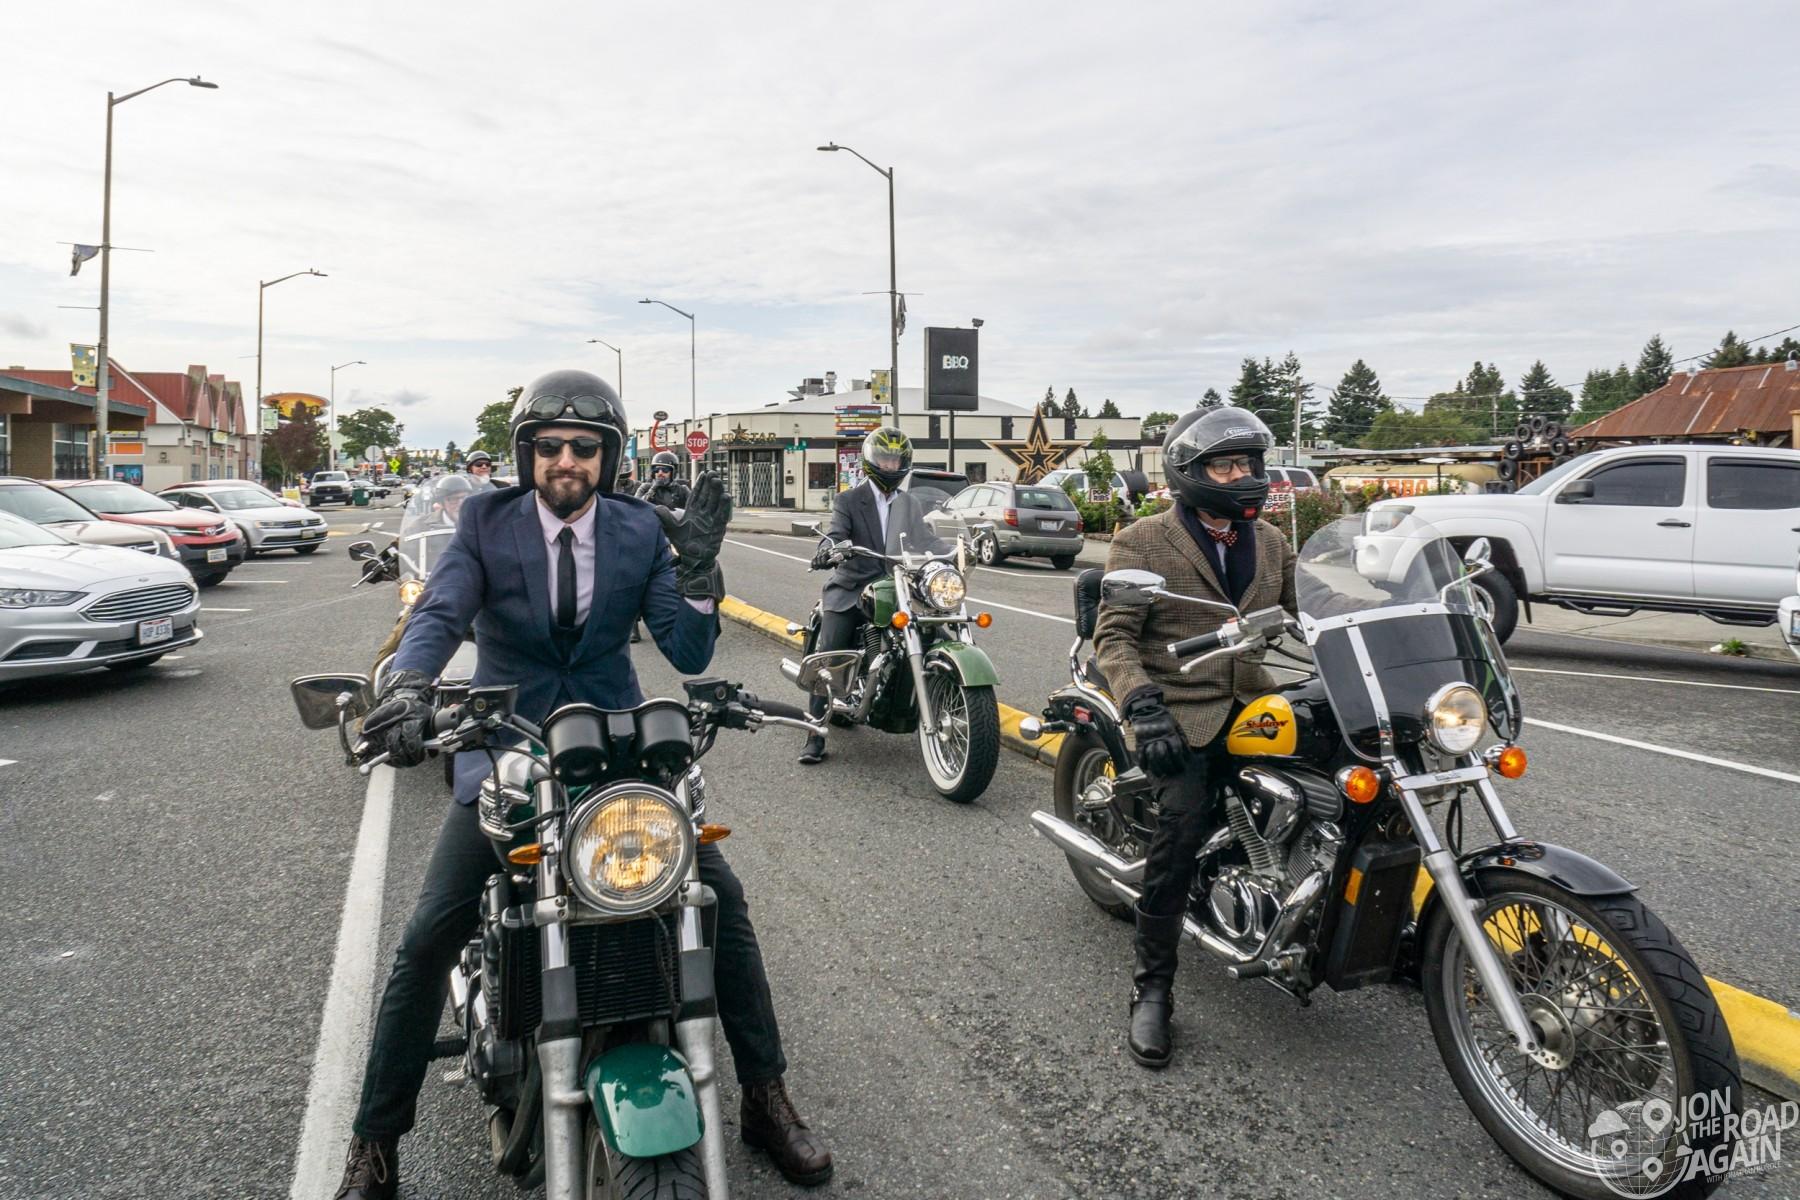 Seattle Distinguished Gentleman's Ride 2019